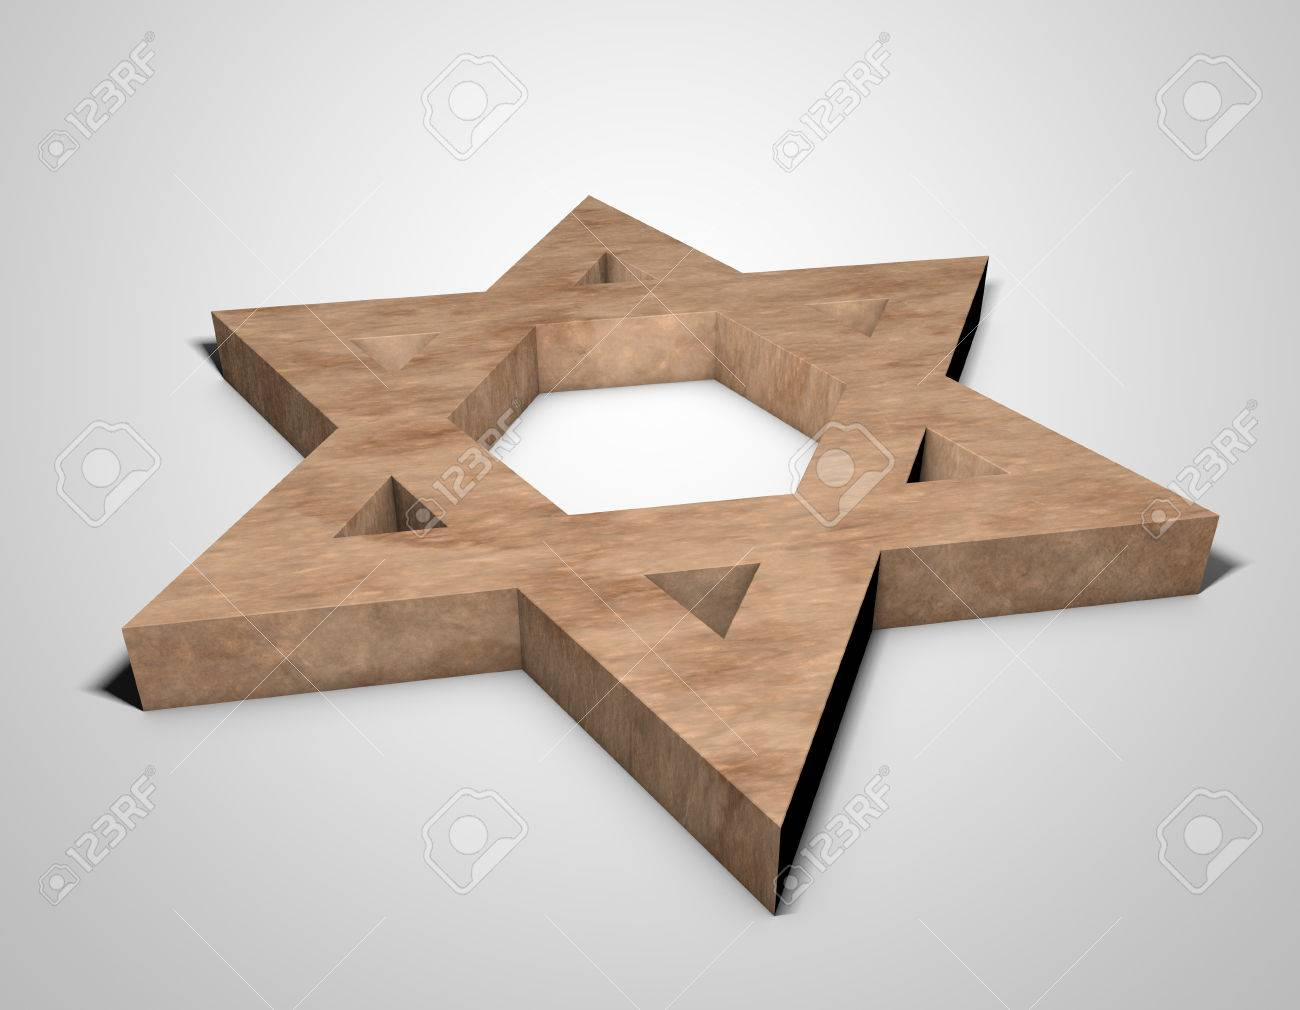 stylized image Star of David made of stone - 74937621